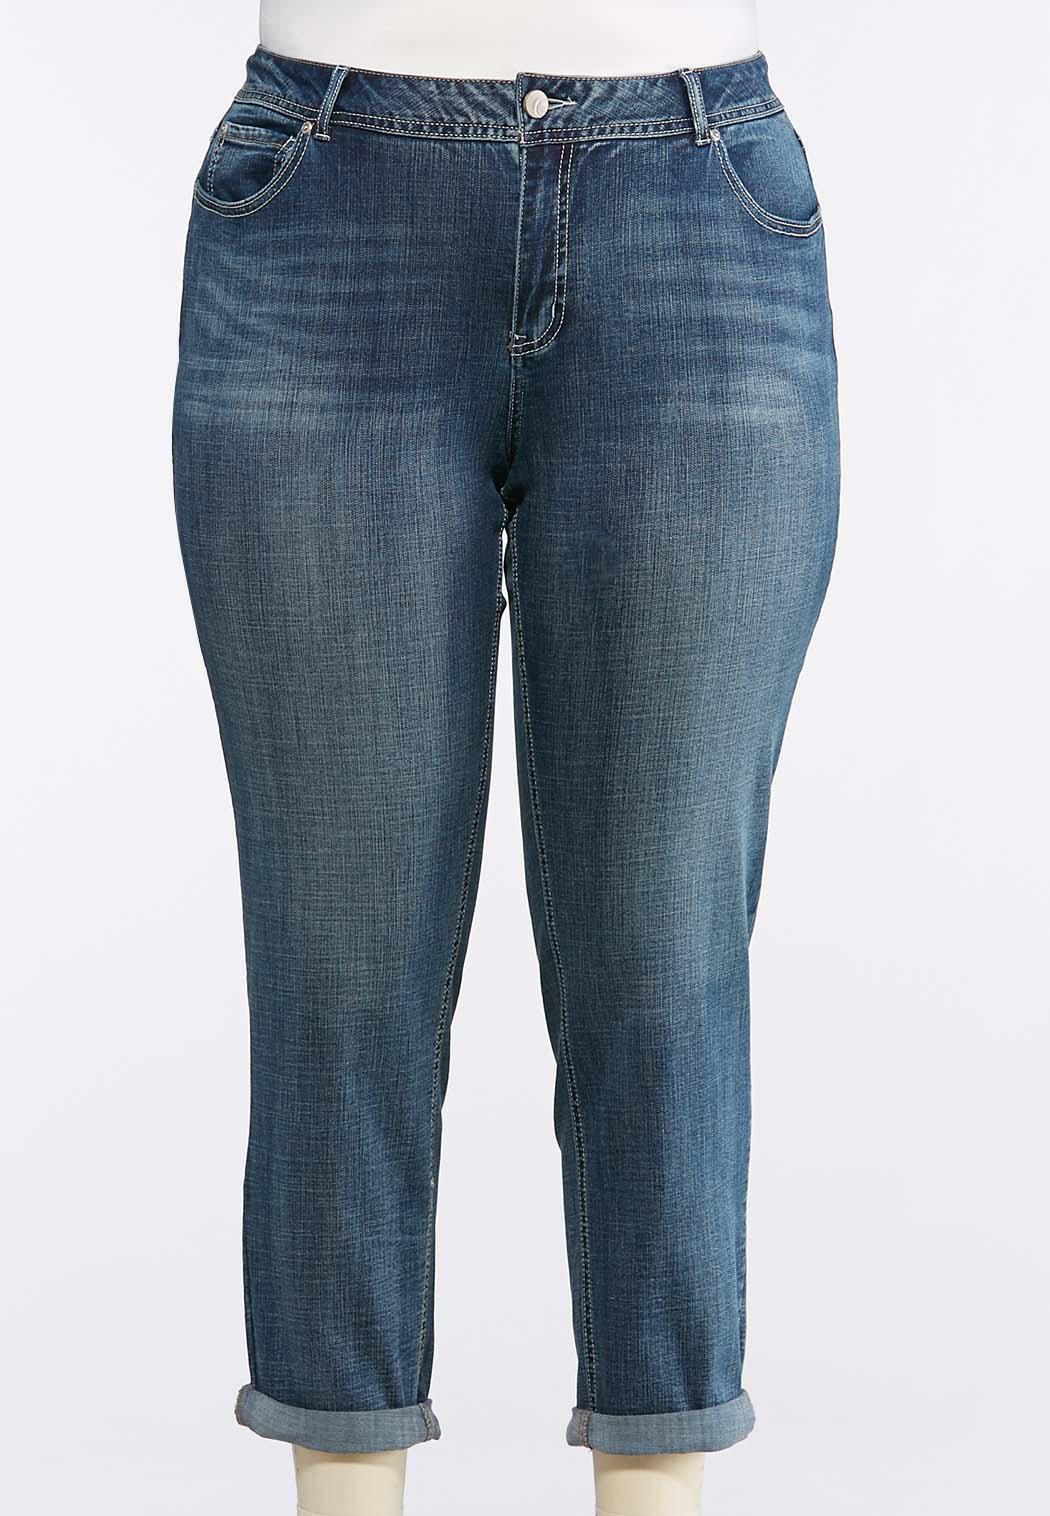 6e2624c4e03db Plus Size Light Wash Skinny Ankle Jeans Ankle Pants Cato Fashions